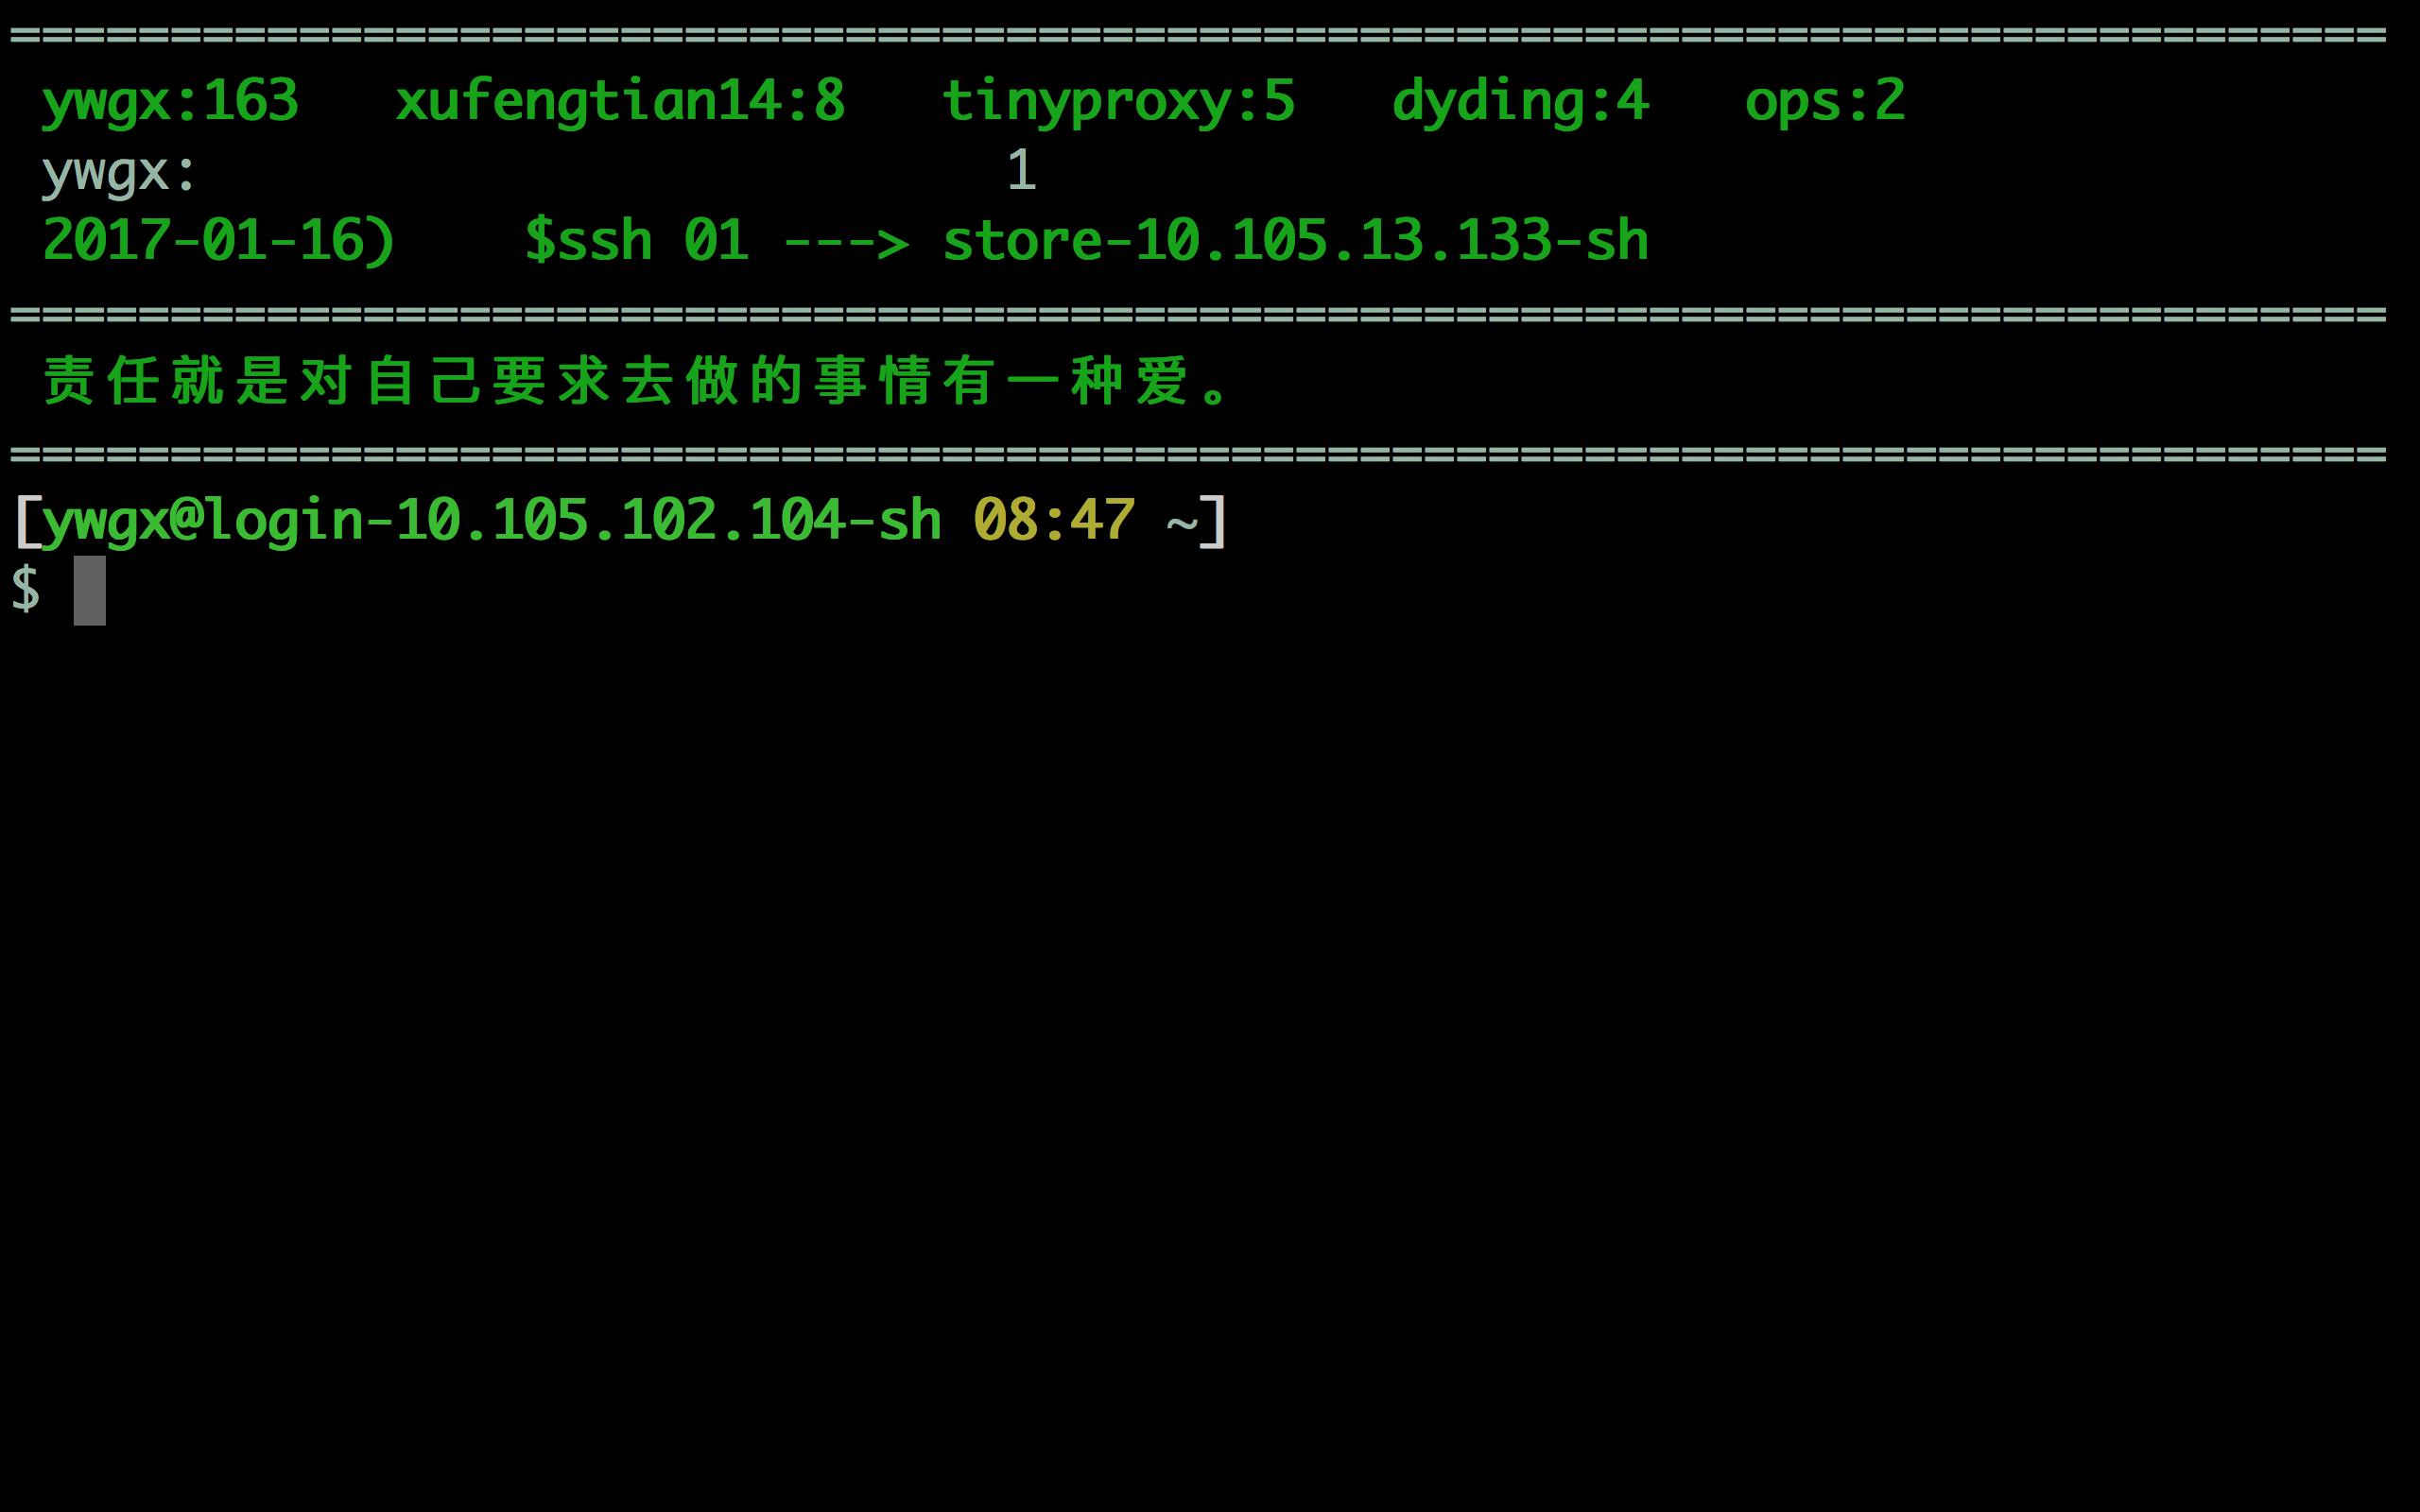 登录login.png-180.2kB